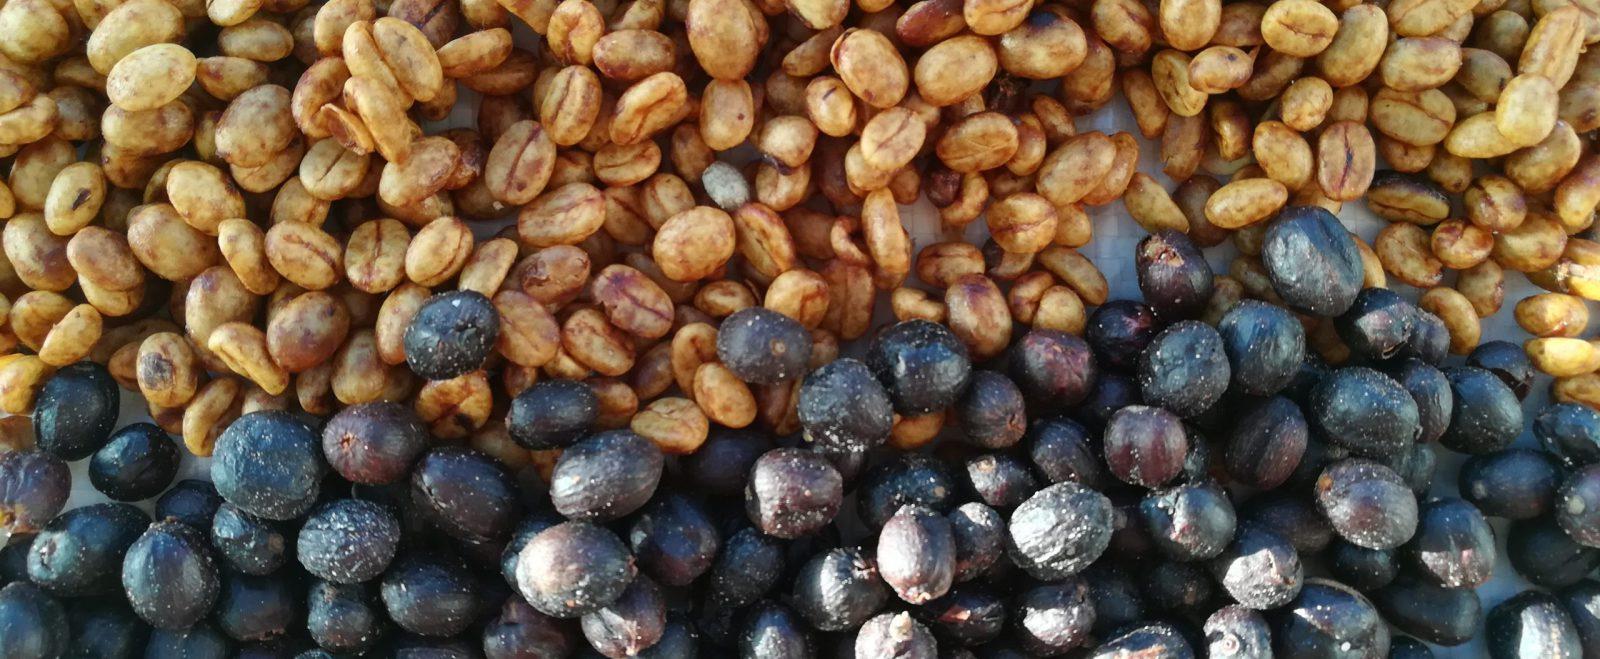 Dryed coffee cherries